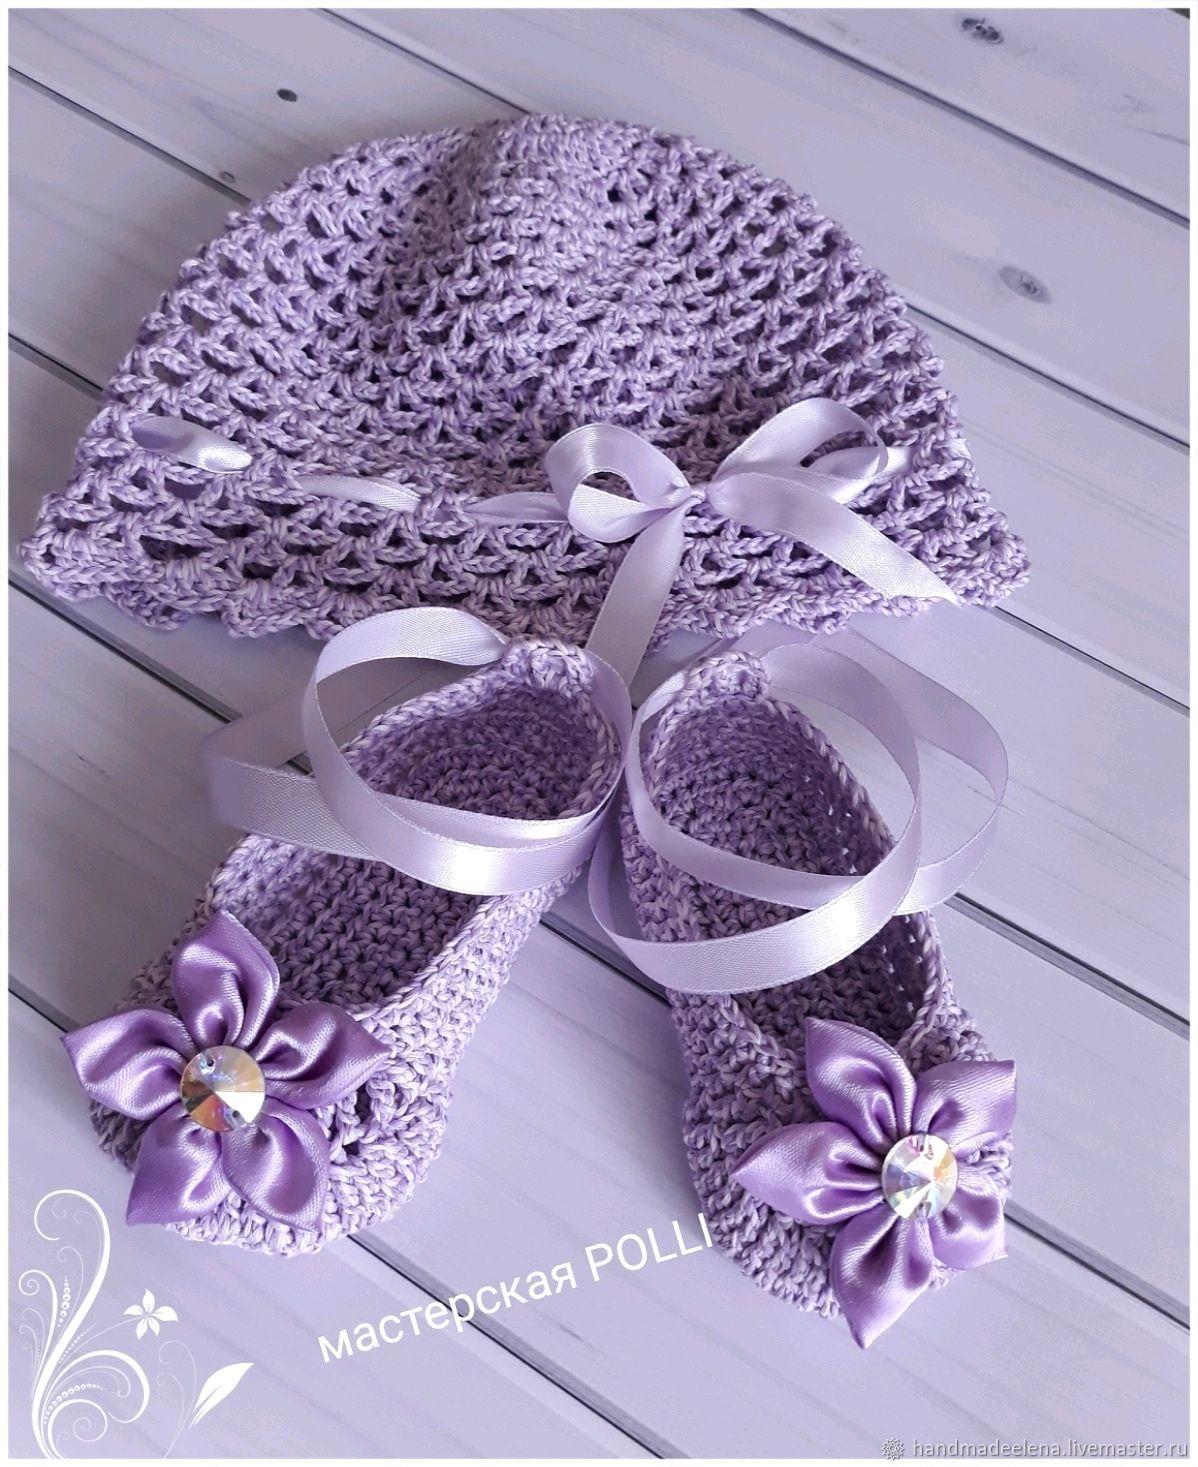 #кукла #вязанаякукла #вязаниеназаказ #мастерскаяPOLLI #knitting #handmadeelenazueva #toyshandmade #dolltoys #dollhandmade  #куклавязаная #crochettoys  #toys #ekotoys #bootiesforgirl